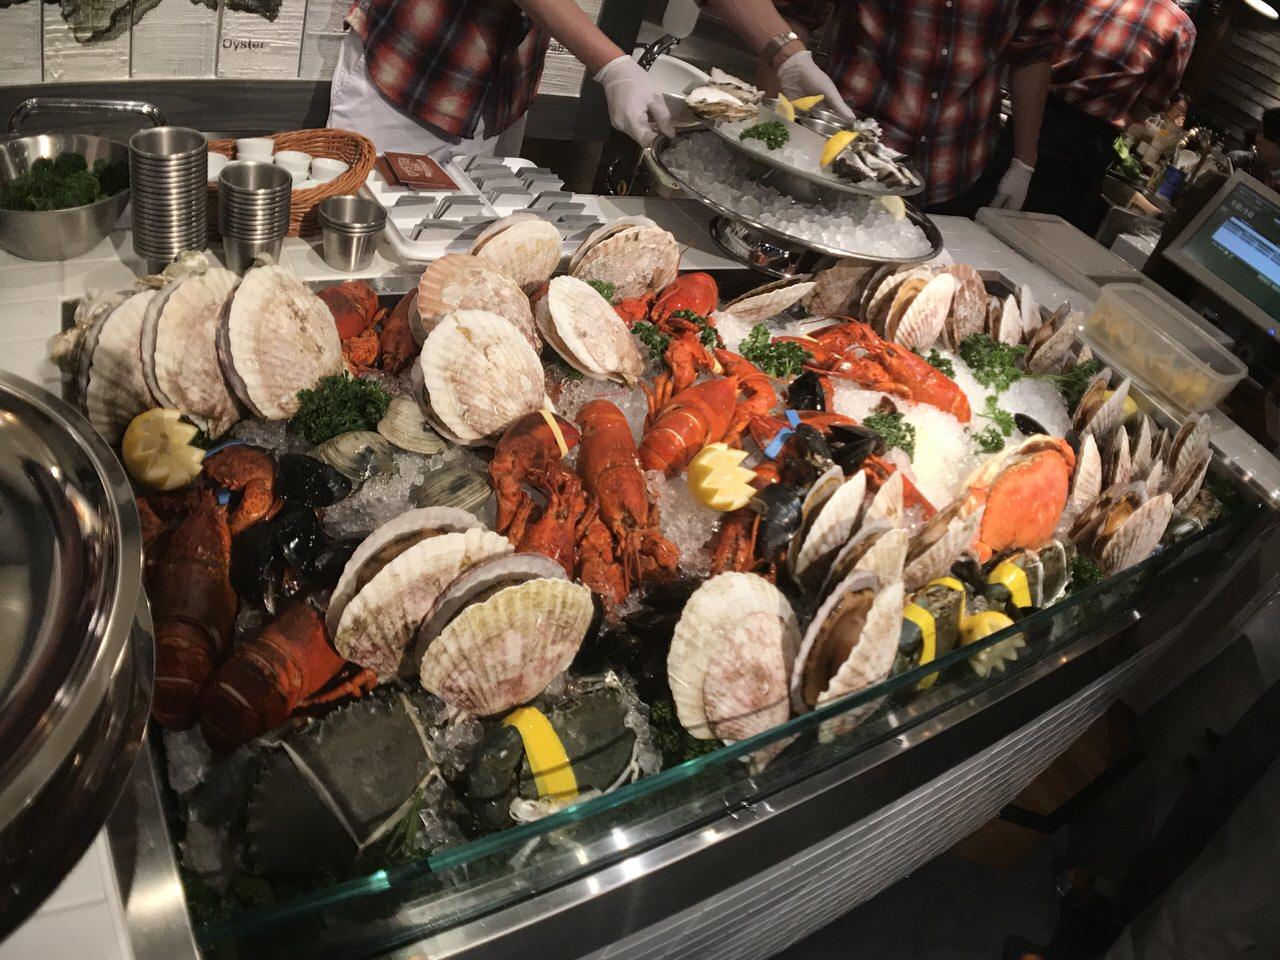 Shinjuku nishiguchi oyster bar 3210